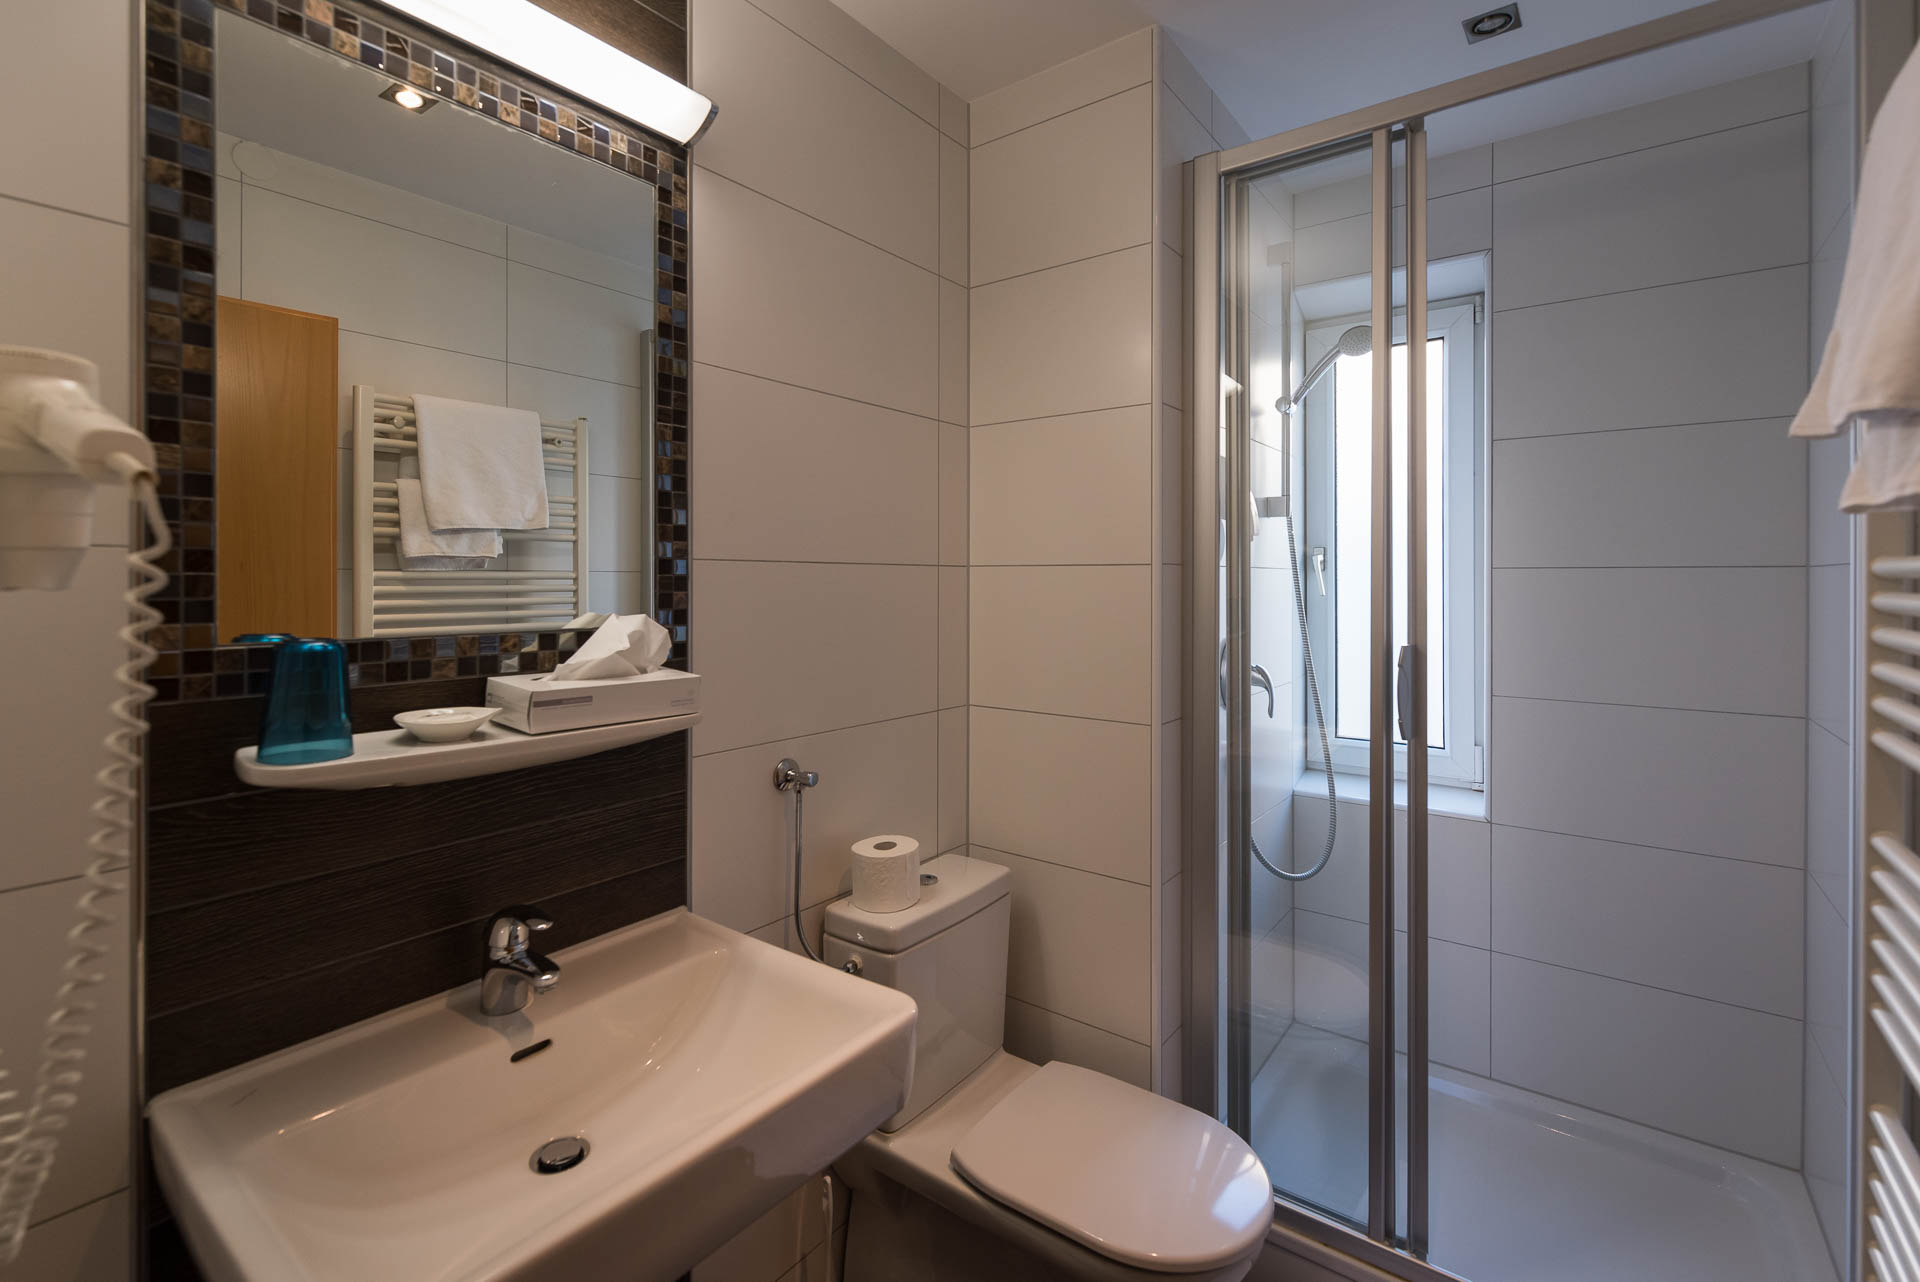 Hotel Almtalerhof Bad 76821